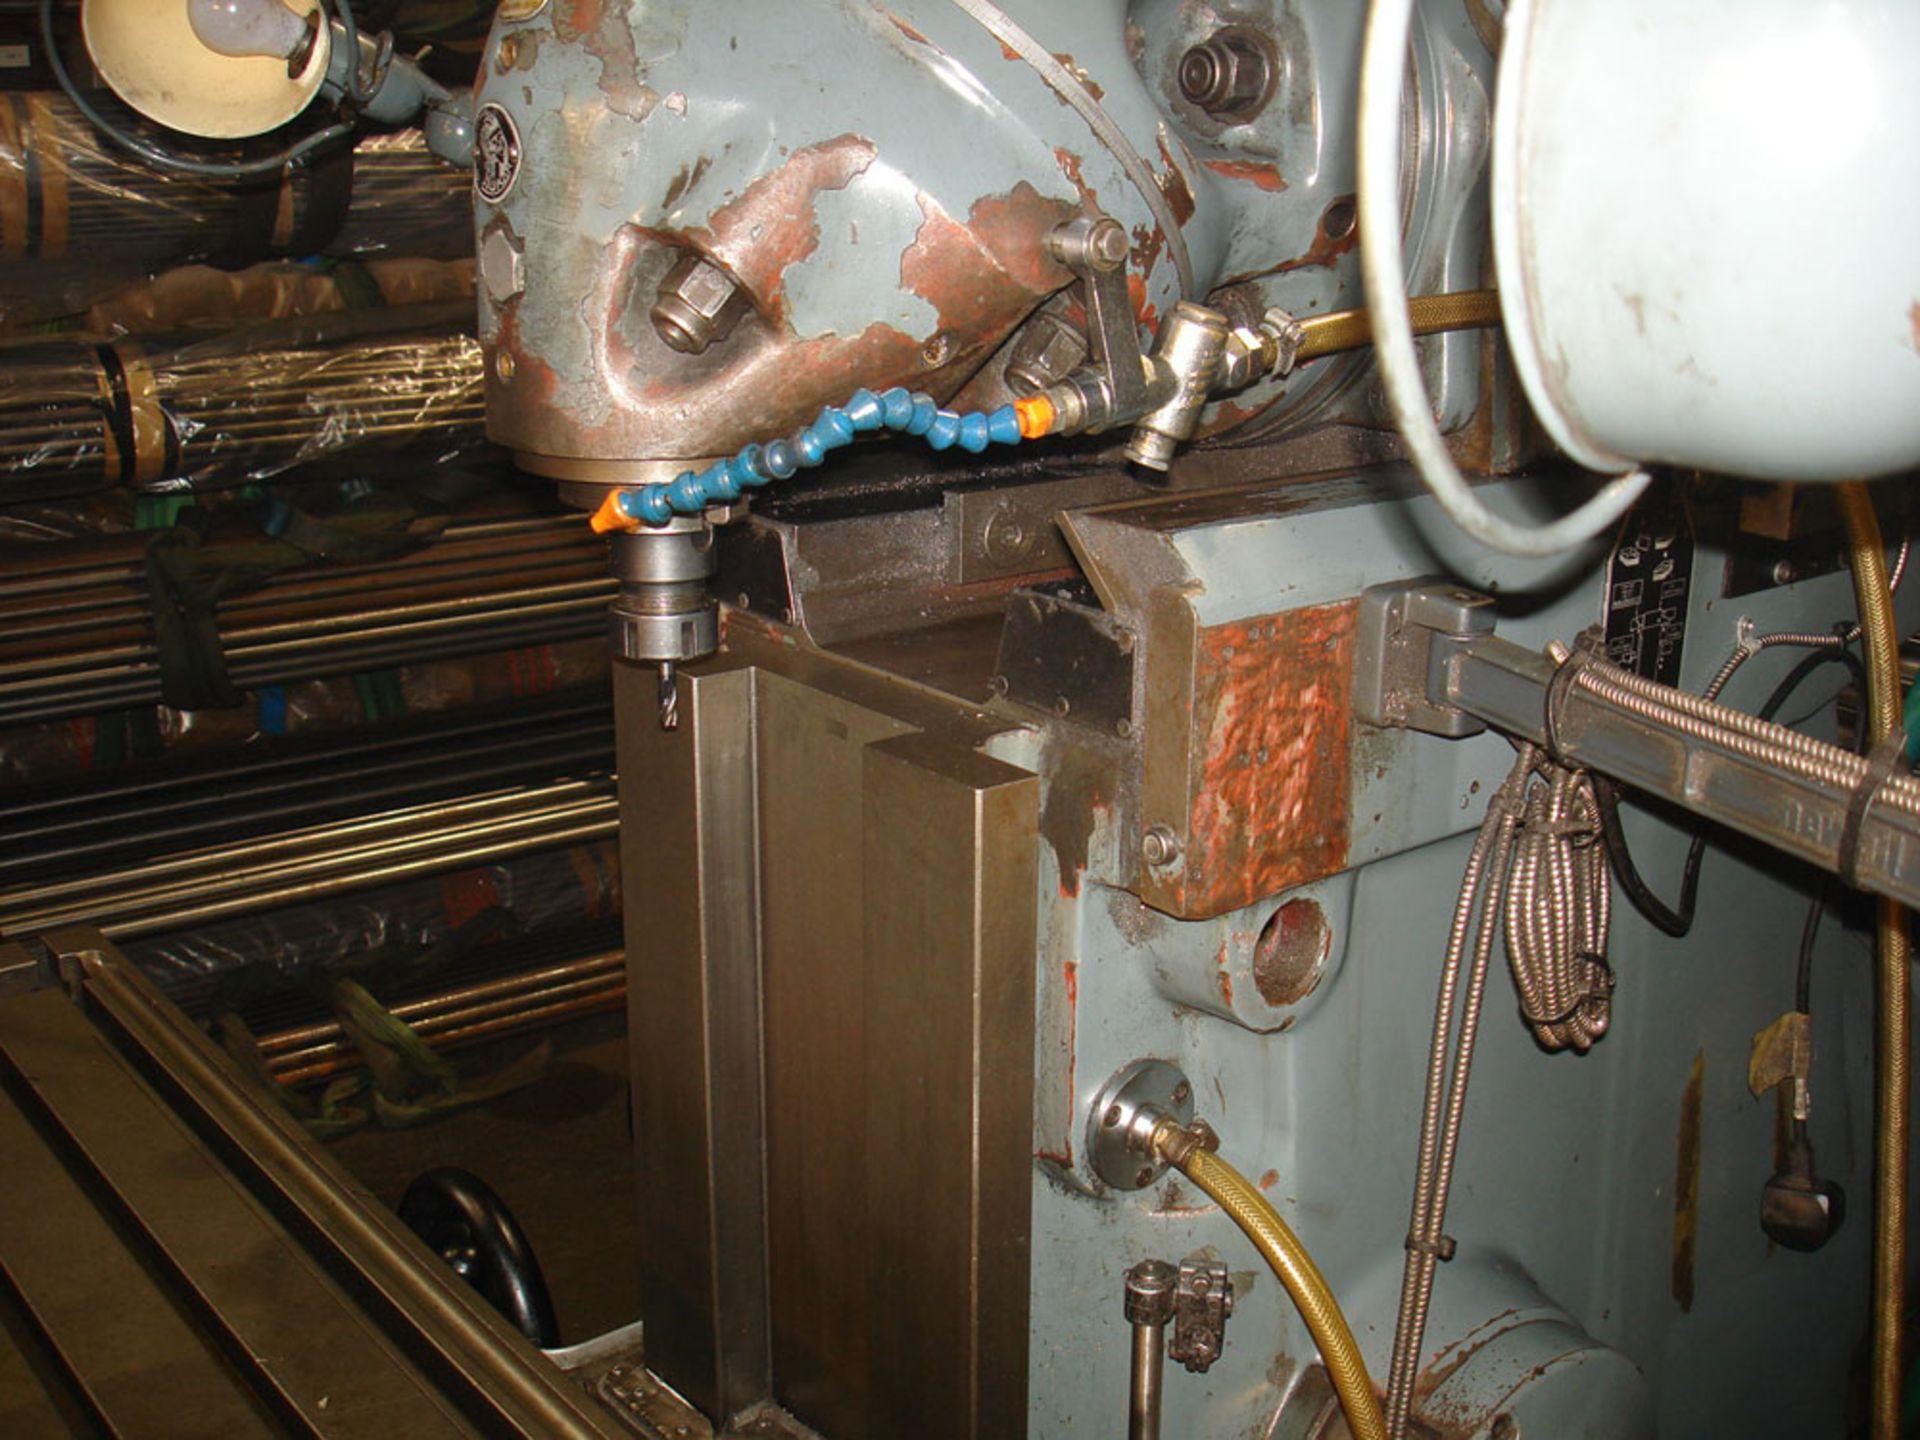 Huron NU5 Universal Milling Machine. Universal Head. Table 1600 x 460 mm. - Image 6 of 7